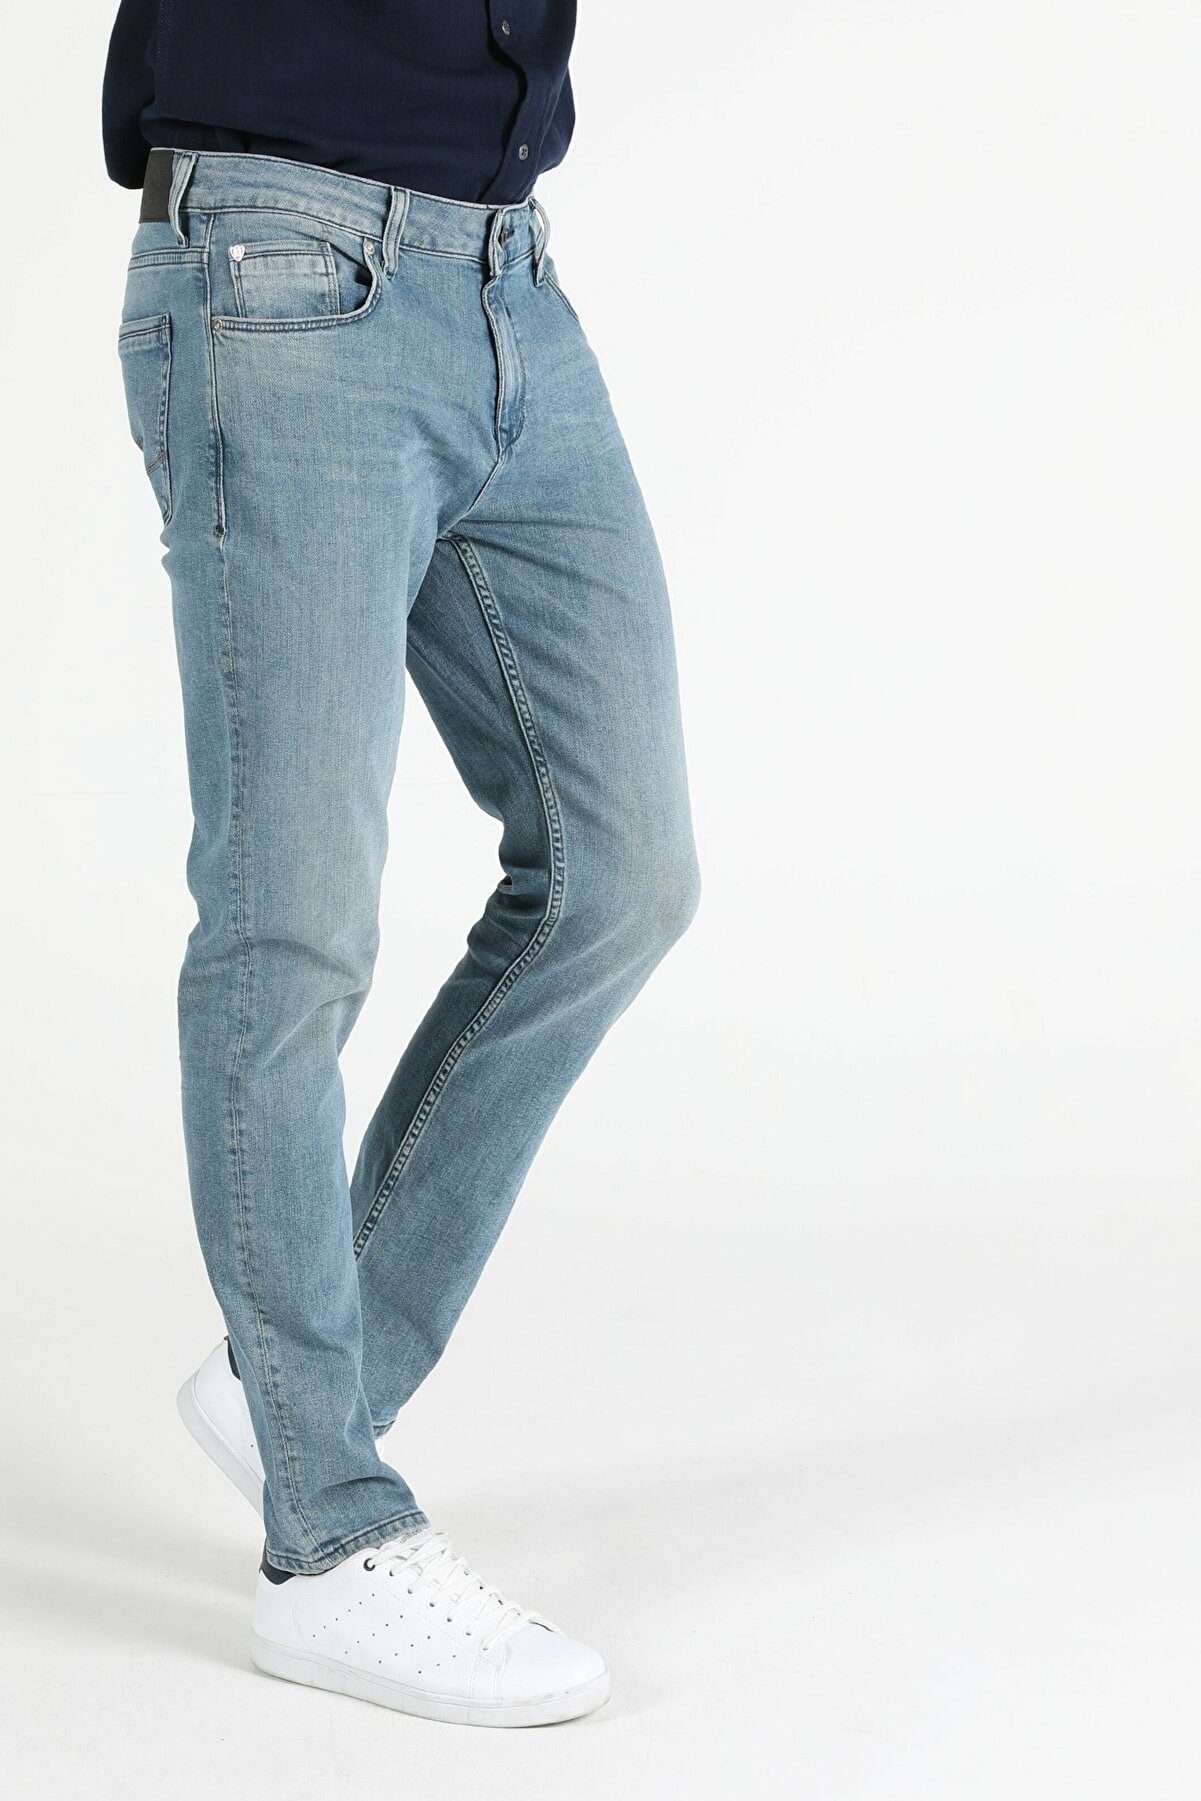 Colin's ERKEK 044 Karl Düşük Bel Düz Paça Straight Fit Jean Erkek Jean Pantolon CL1050990